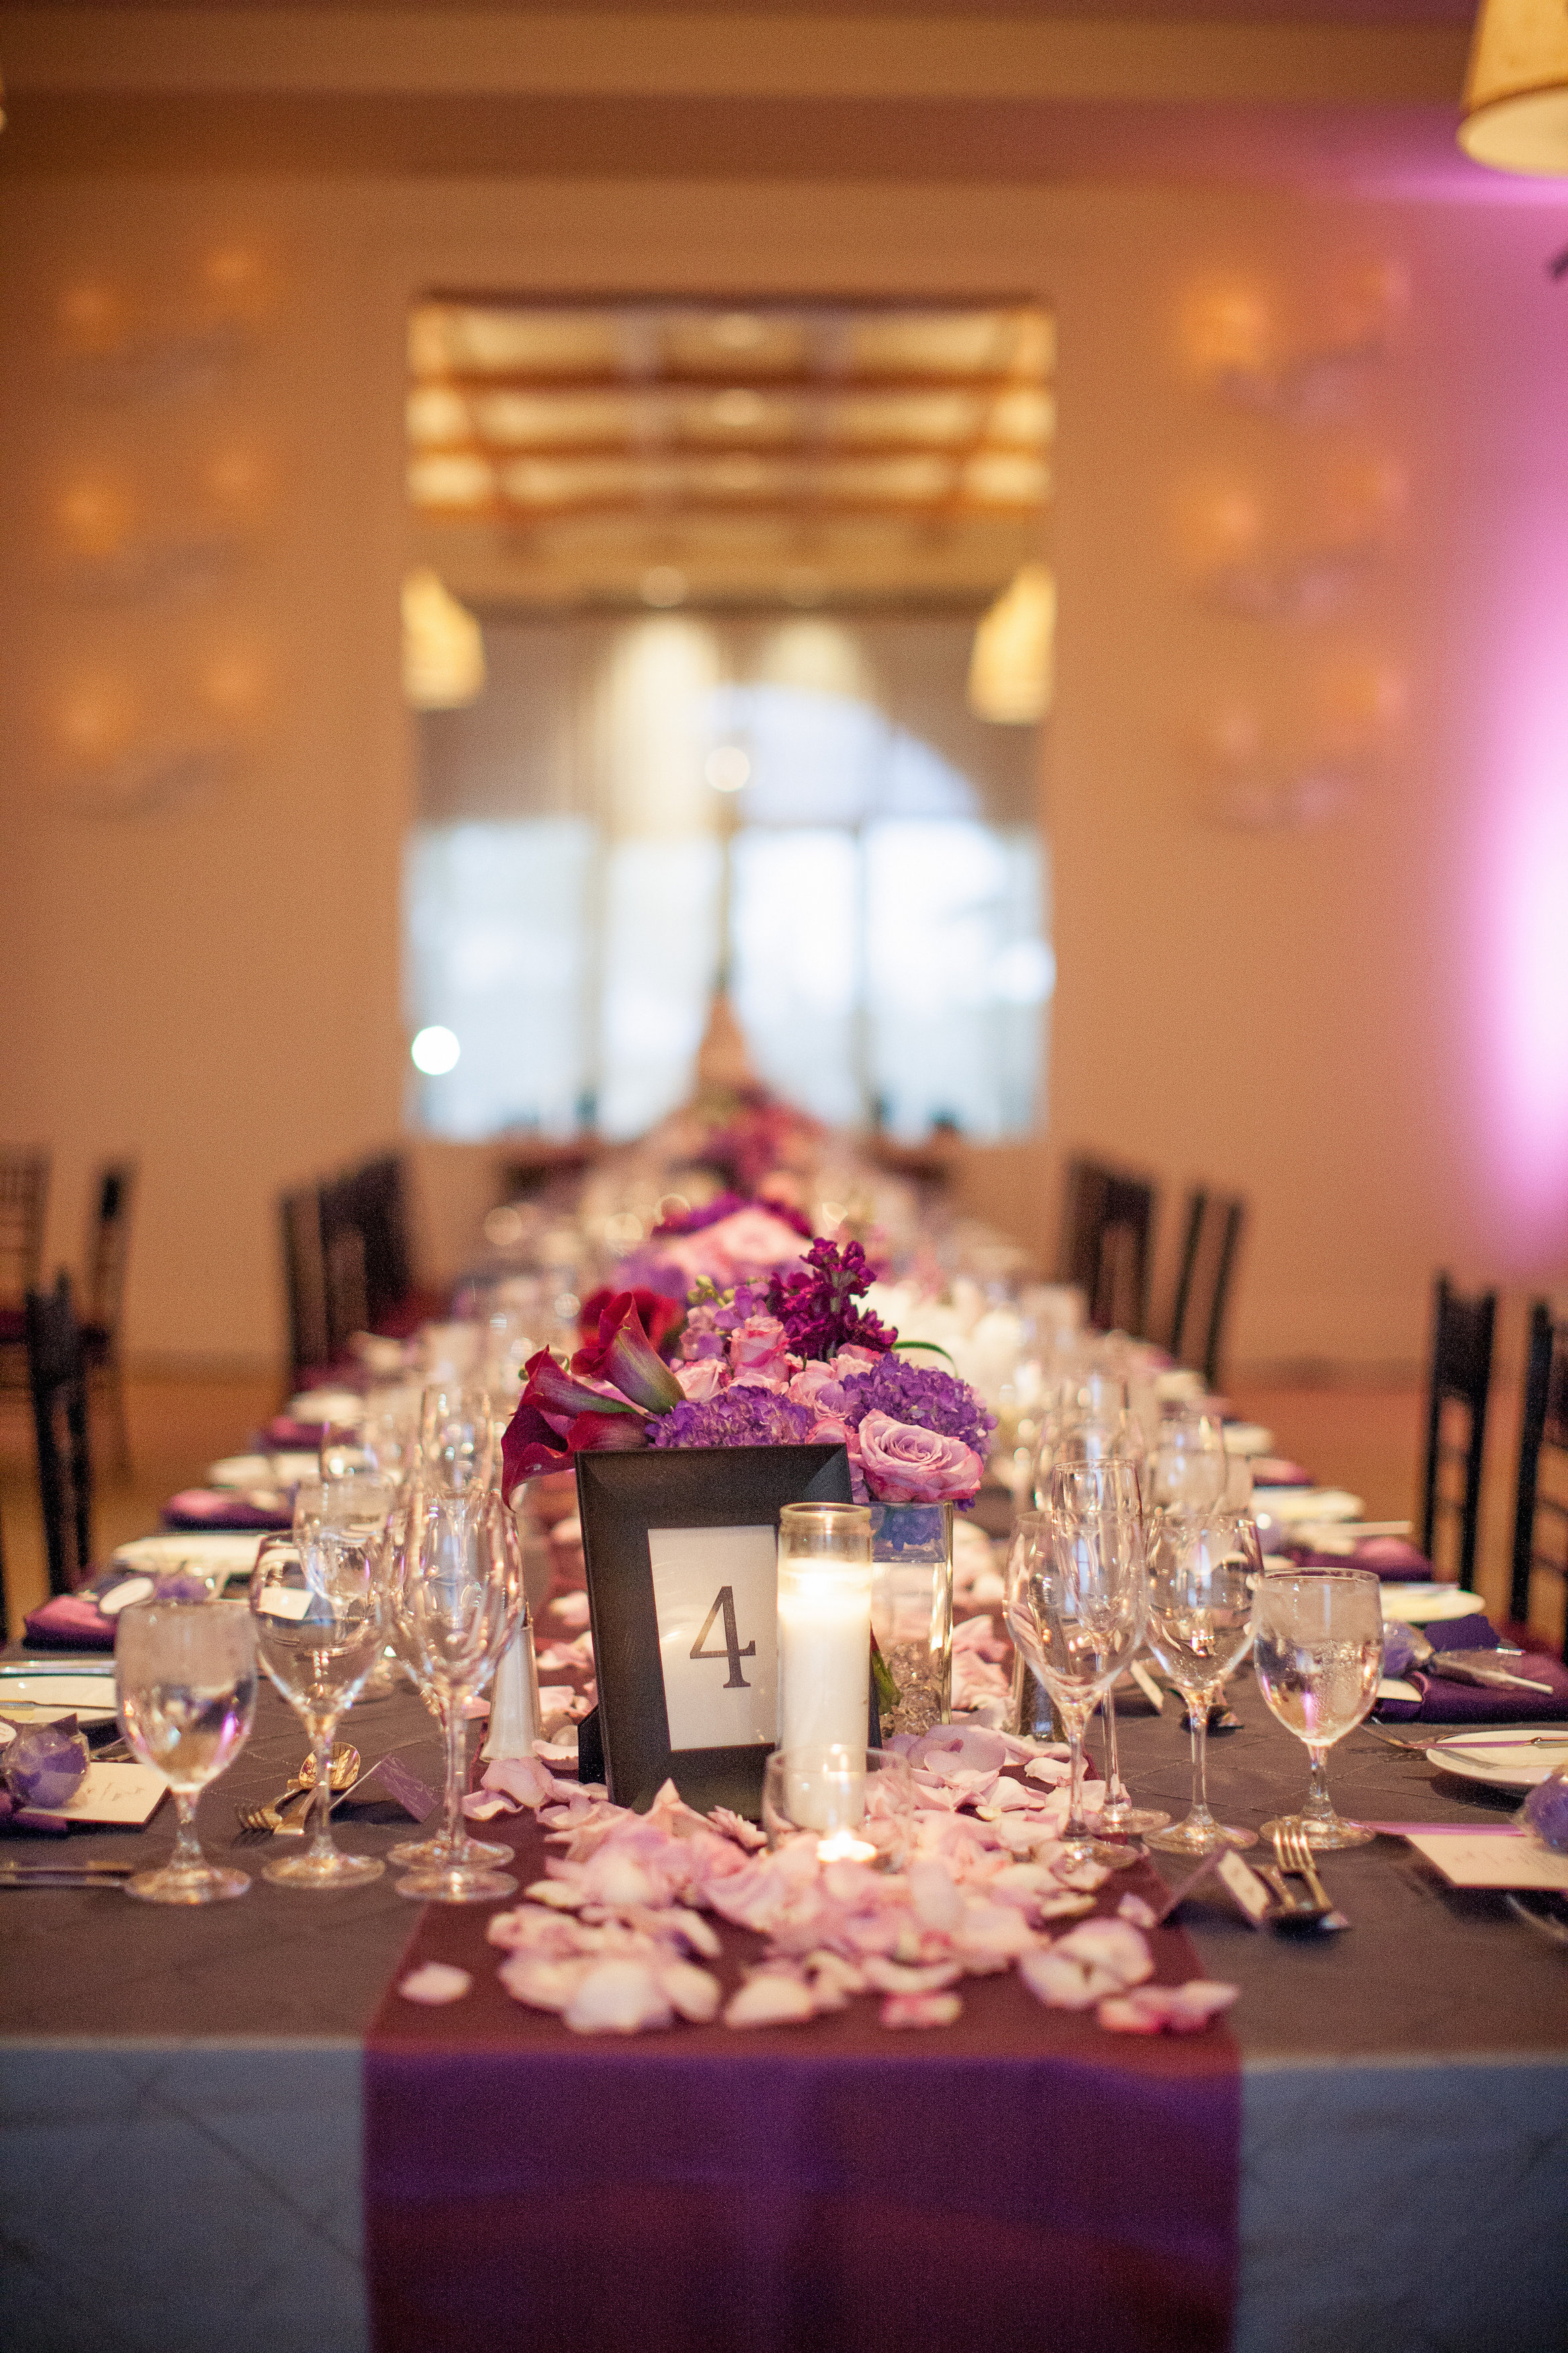 Terranea Resort | A Good Affair Wedding & Event Production | Gabriel Ryan Photographers